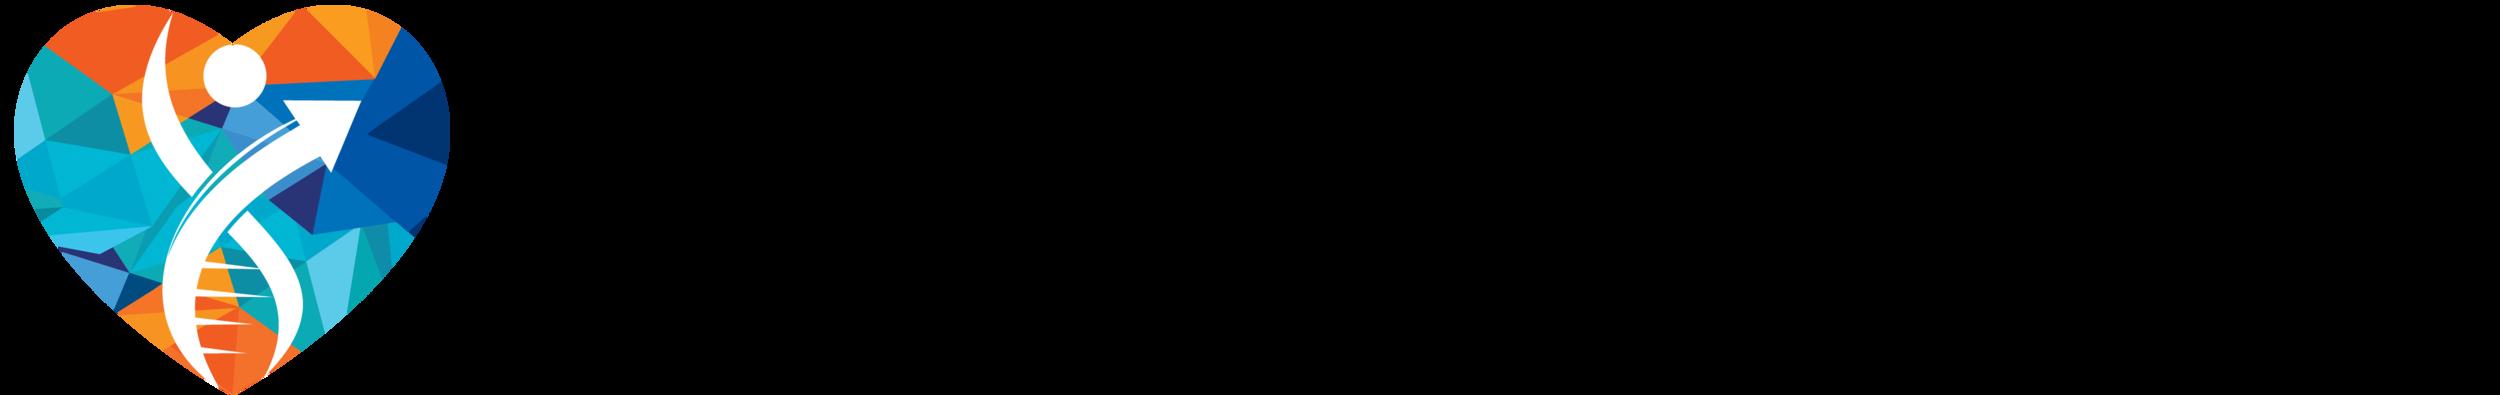 AMLFullLogo-Black.png